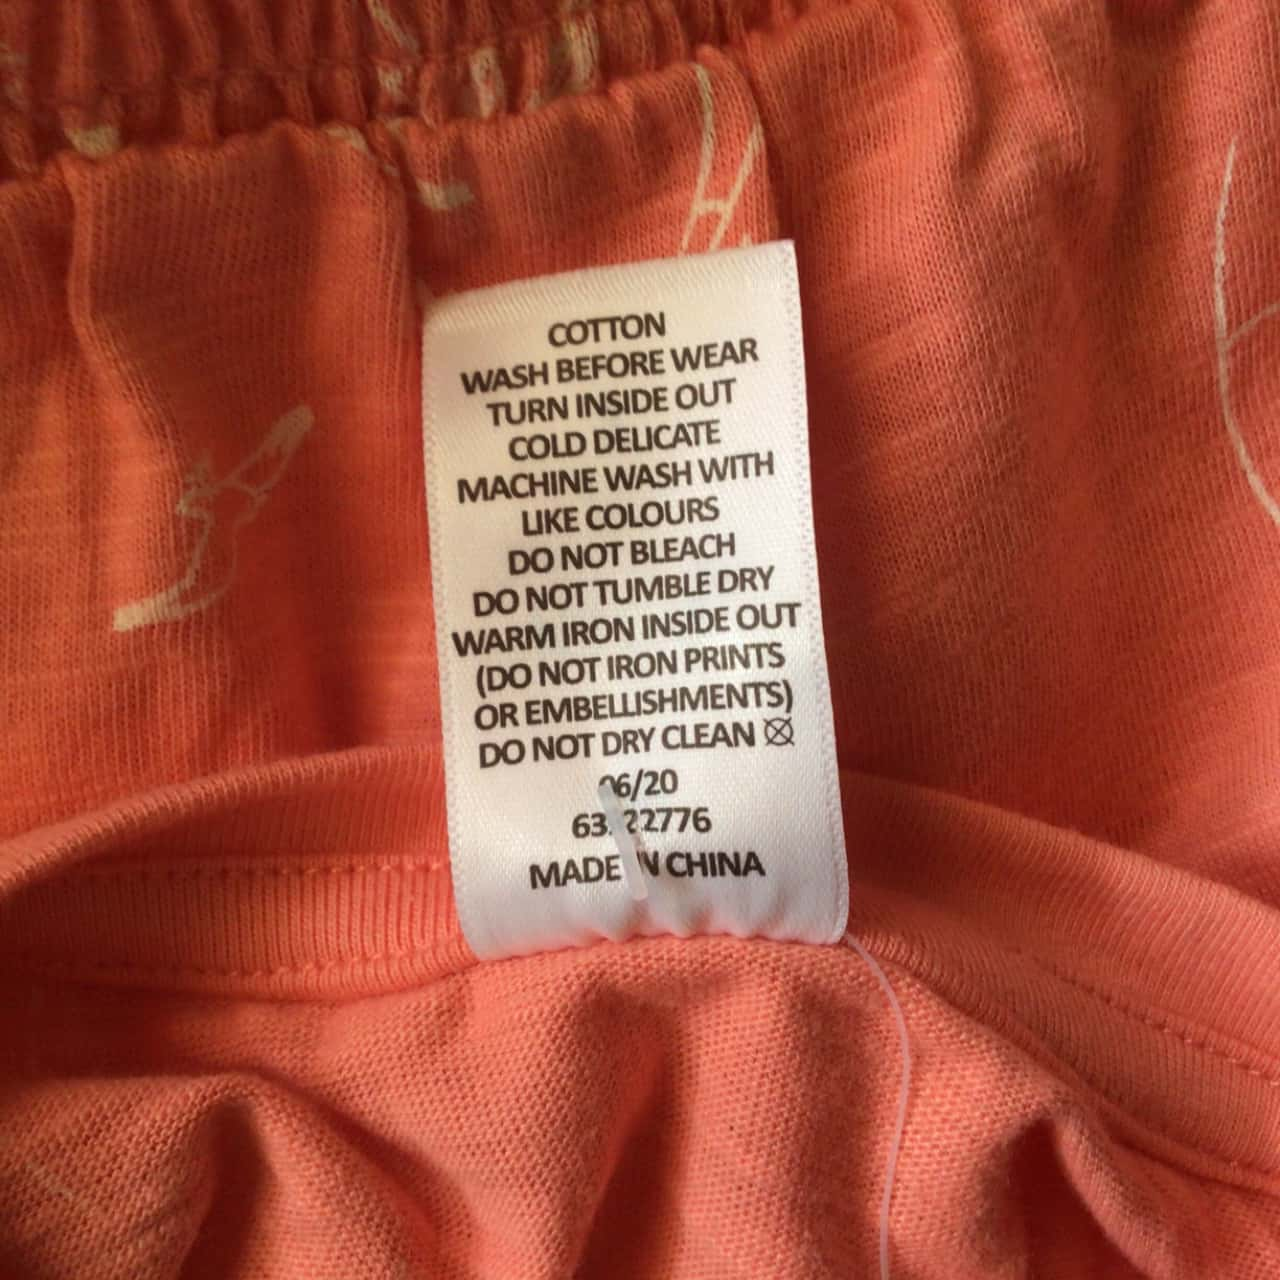 BNWT Target KidsTROPICAL PRINT DRESS  Size 1 Orange/White RRP $16